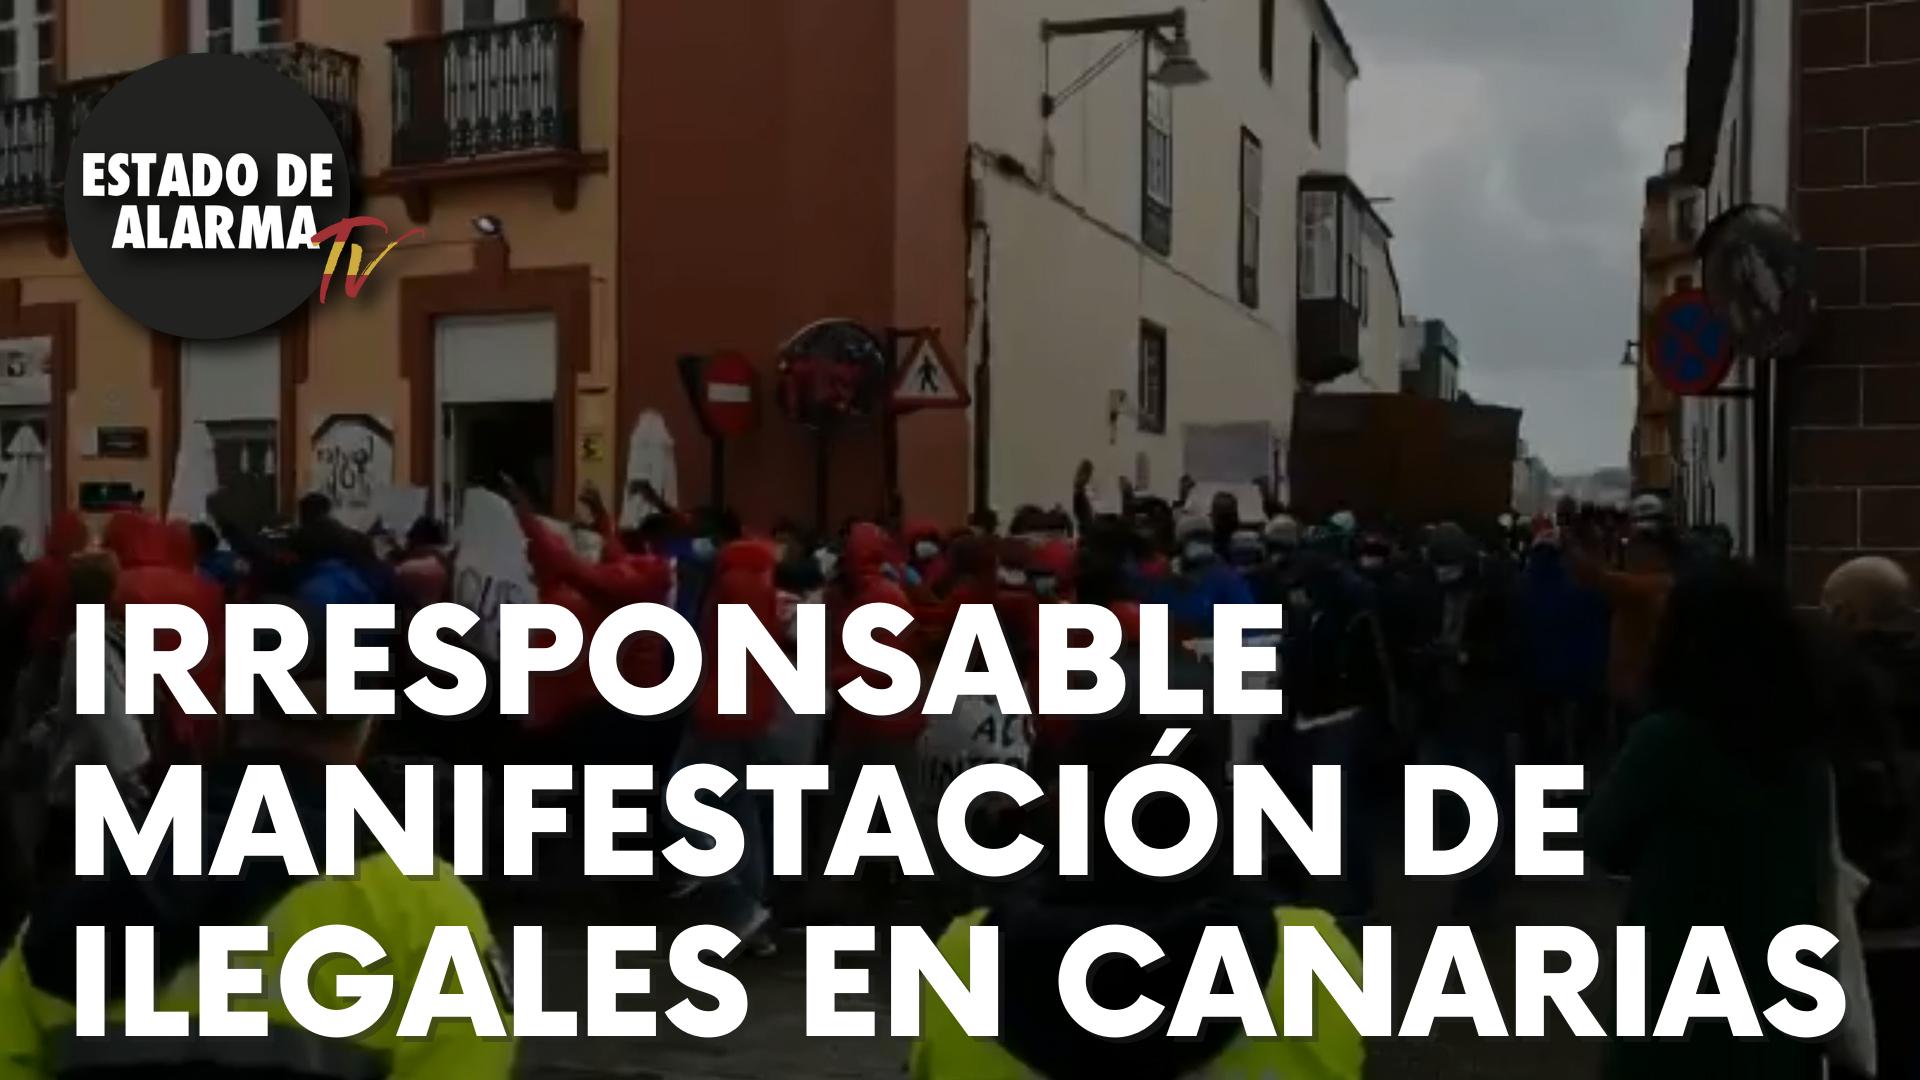 Irresponsable manifestación de ilegales en Canarias.